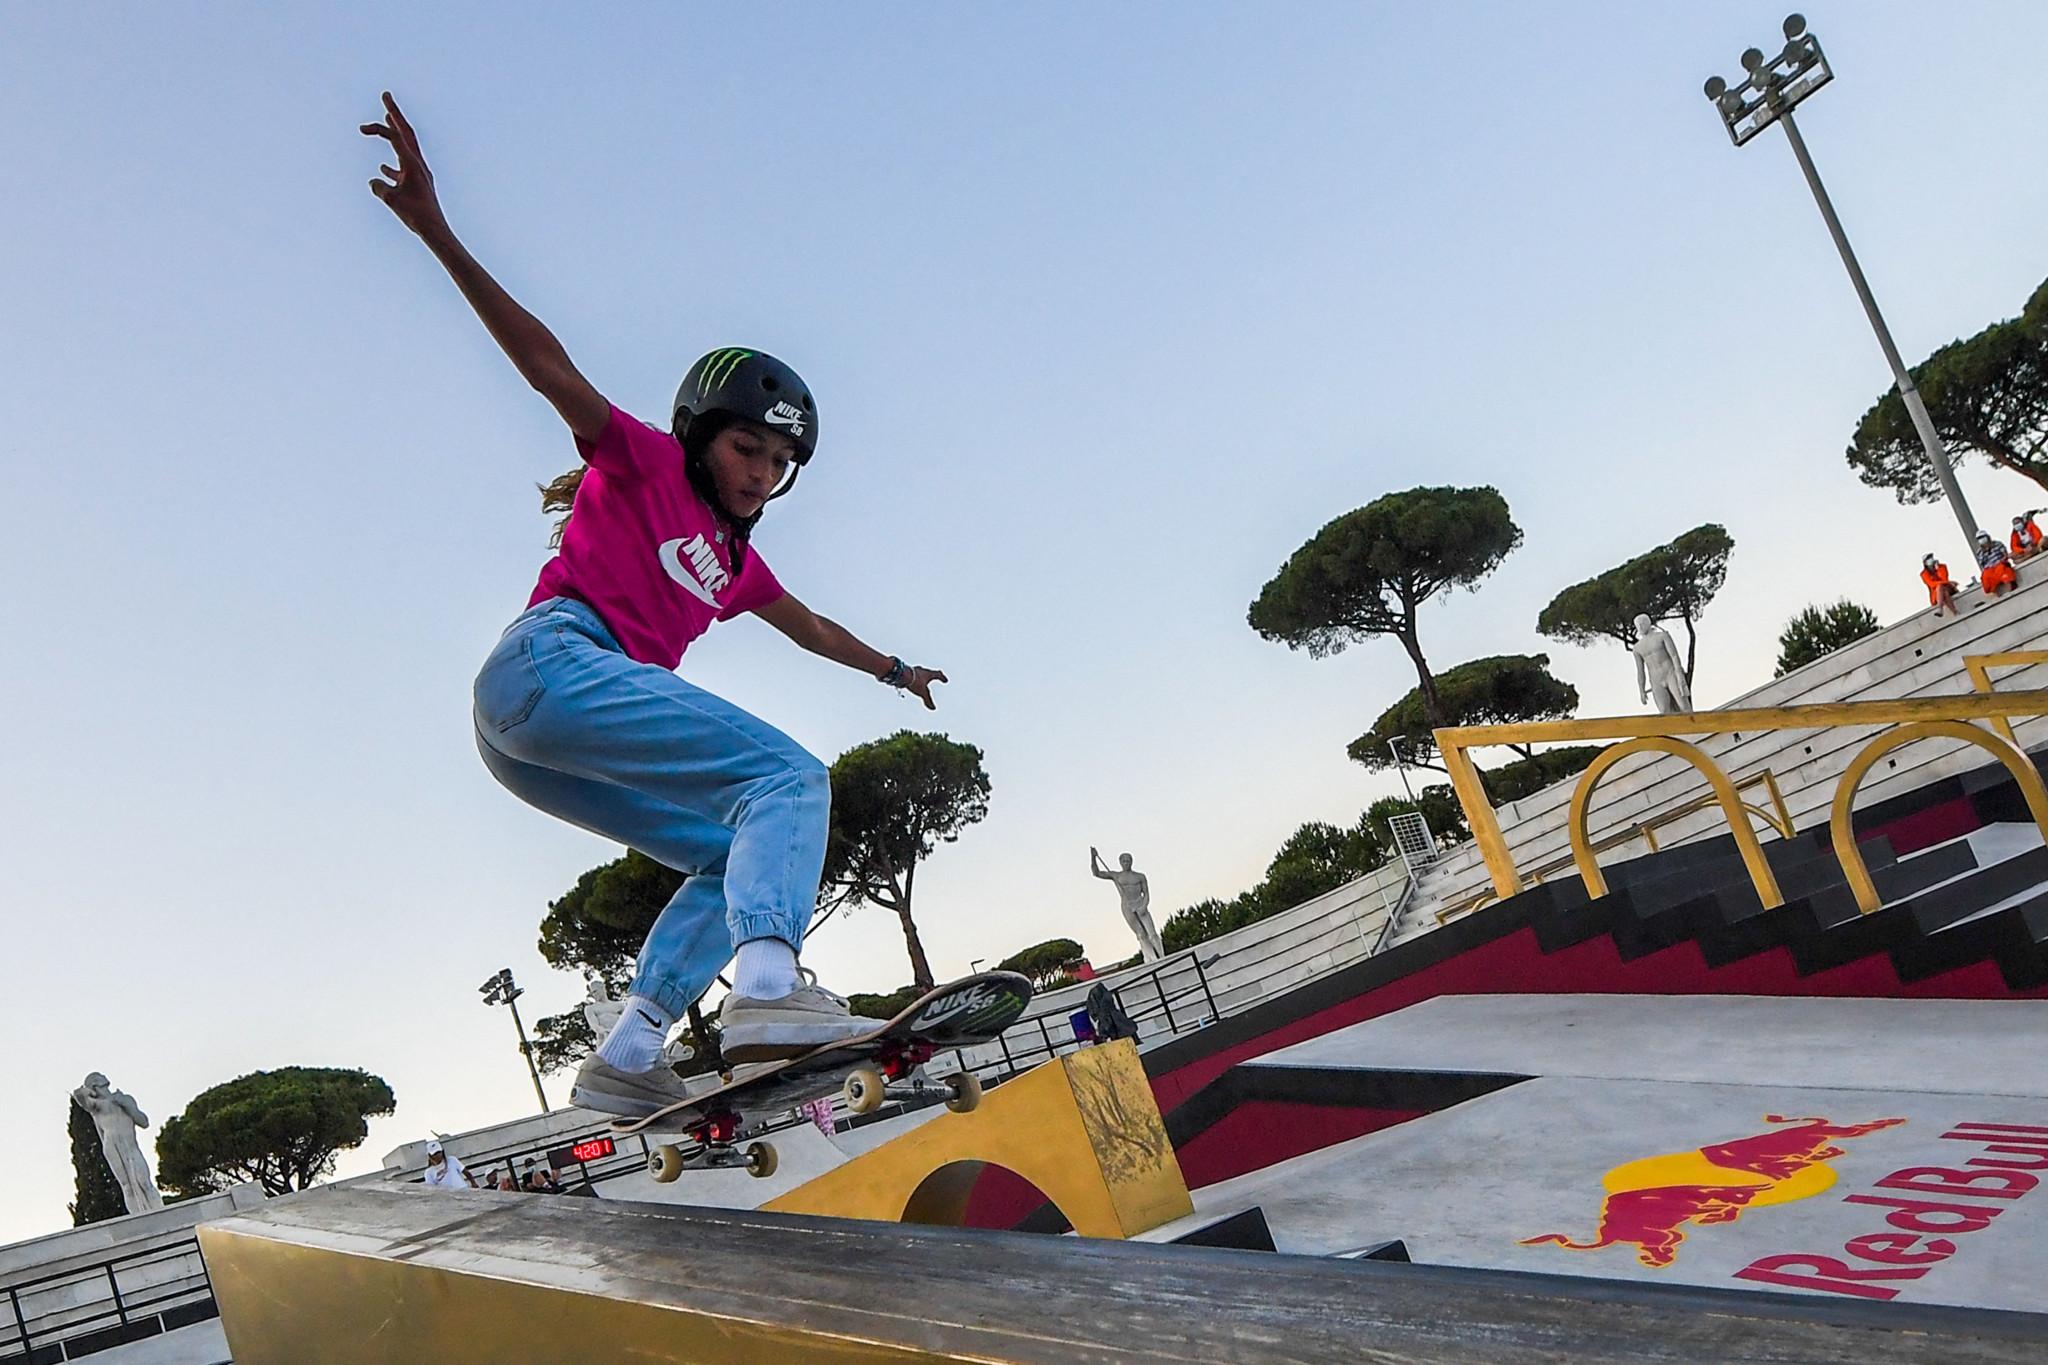 Leal stars in semi-finals at Street Skateboarding World Championships